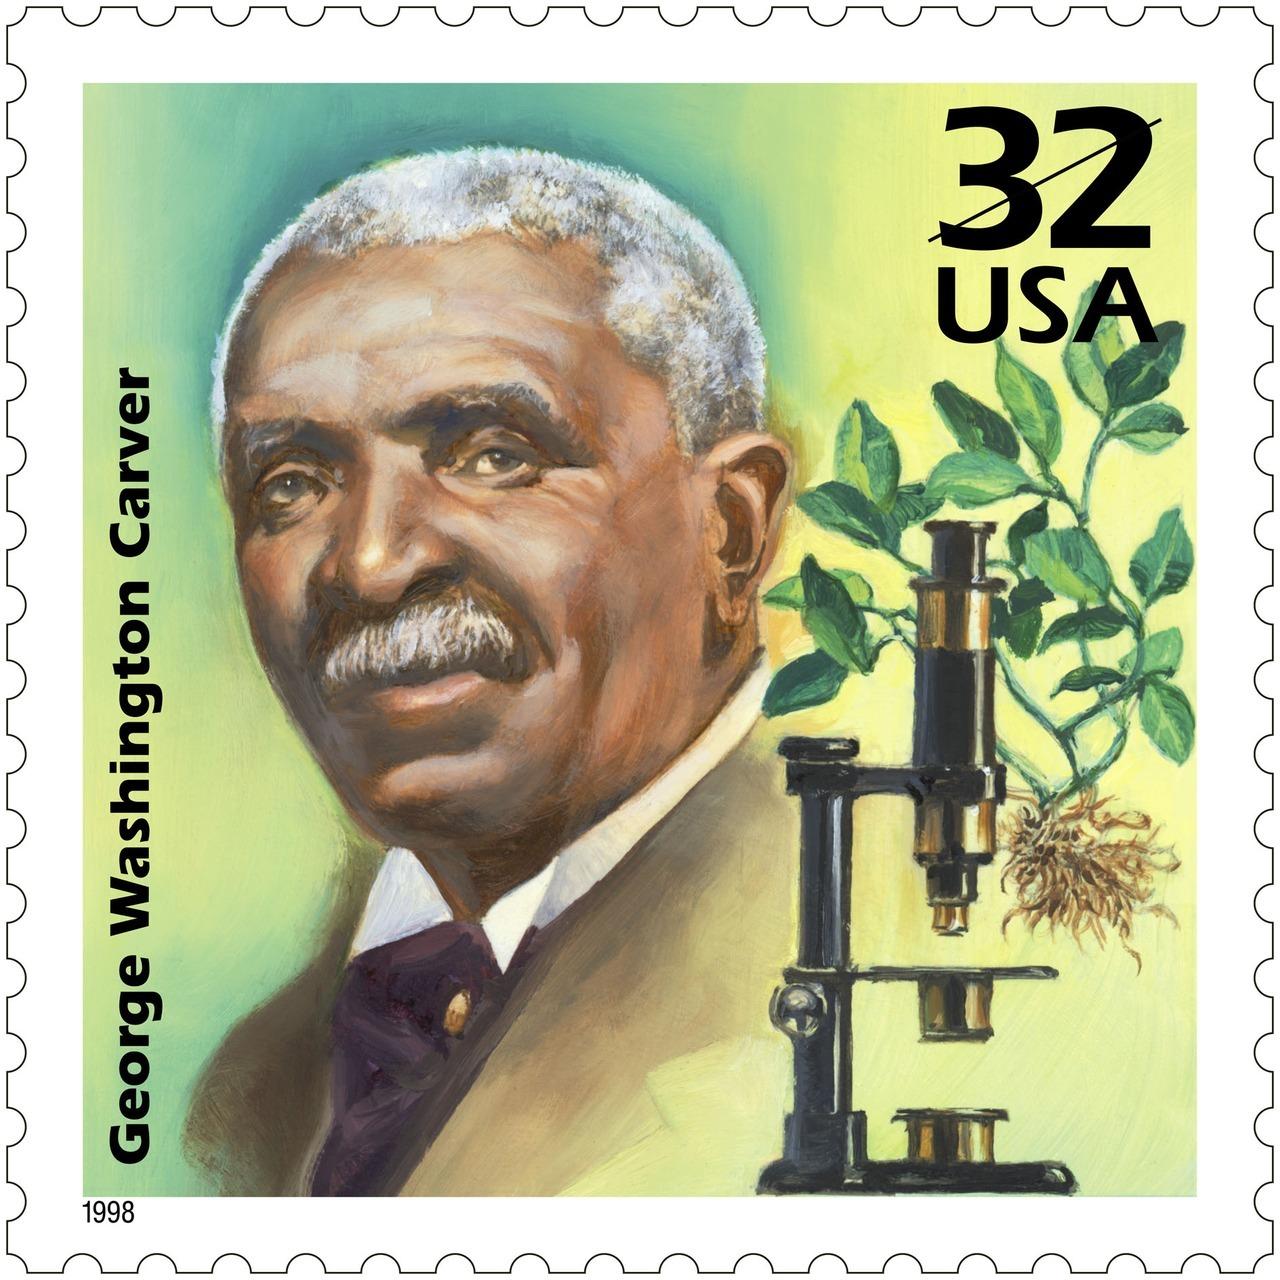 Usps Stamps Happy Birthday George Washington Carver